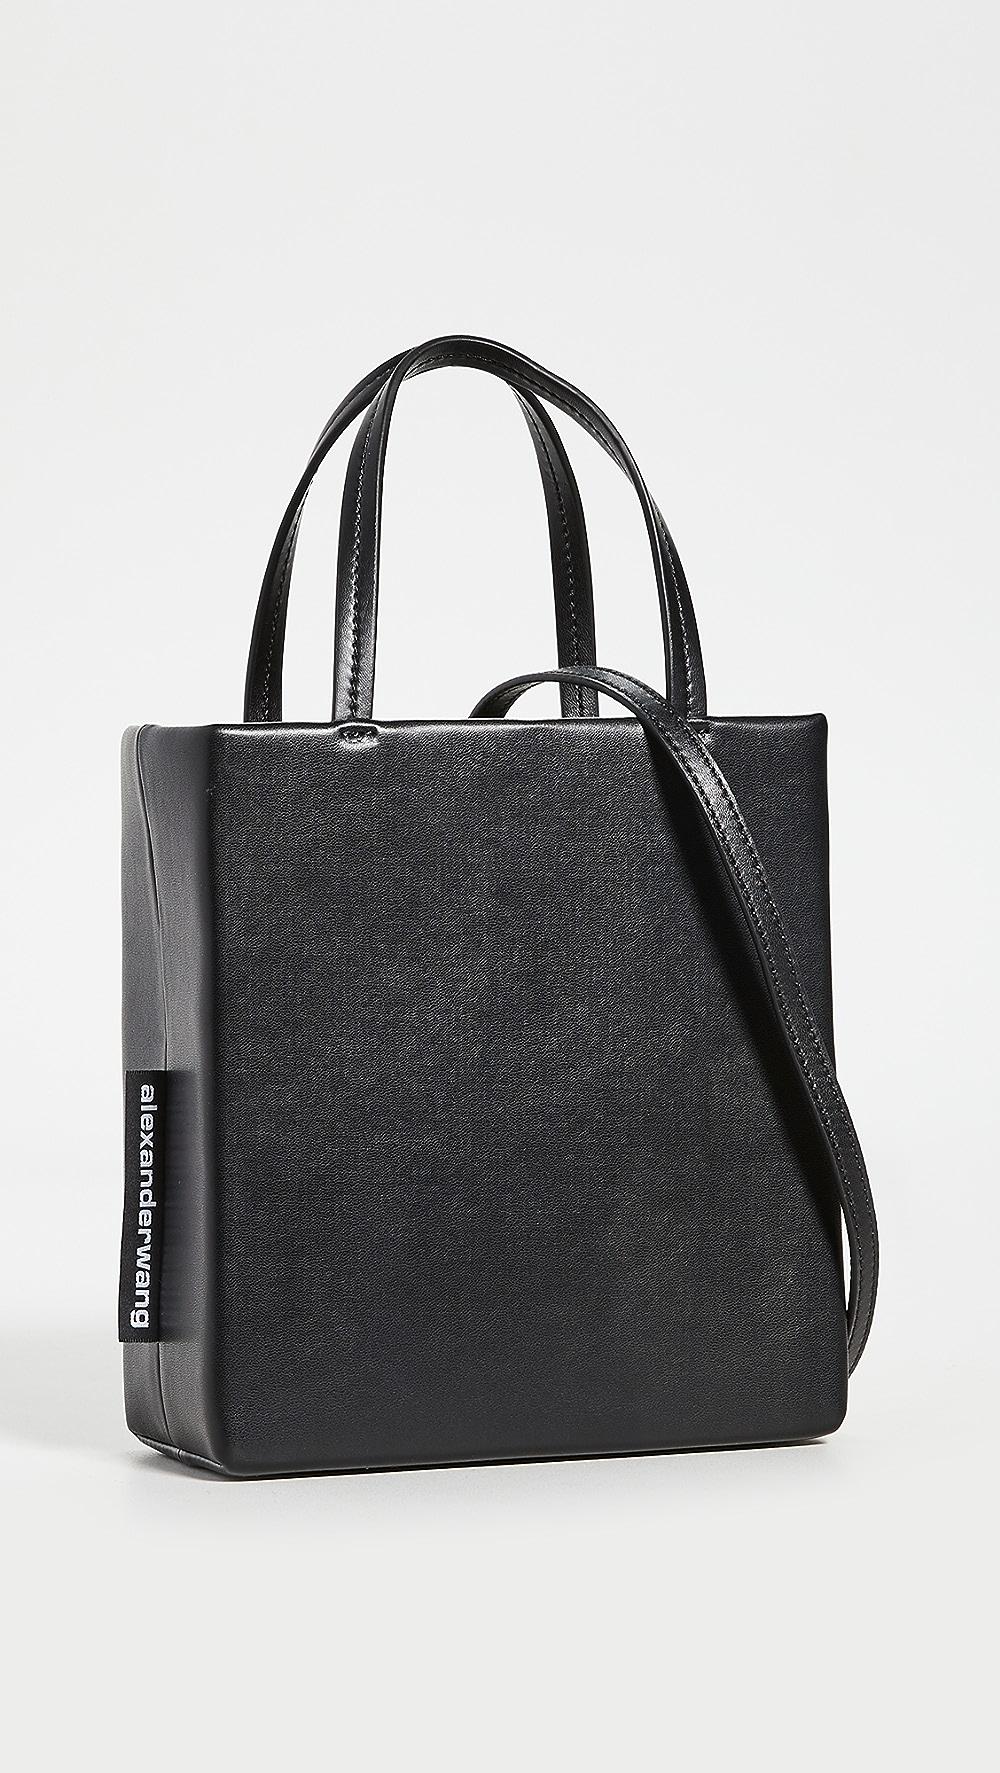 Aspiring Alexander Wang - She E O Mini Crossbody Tote Bag Colours Are Striking